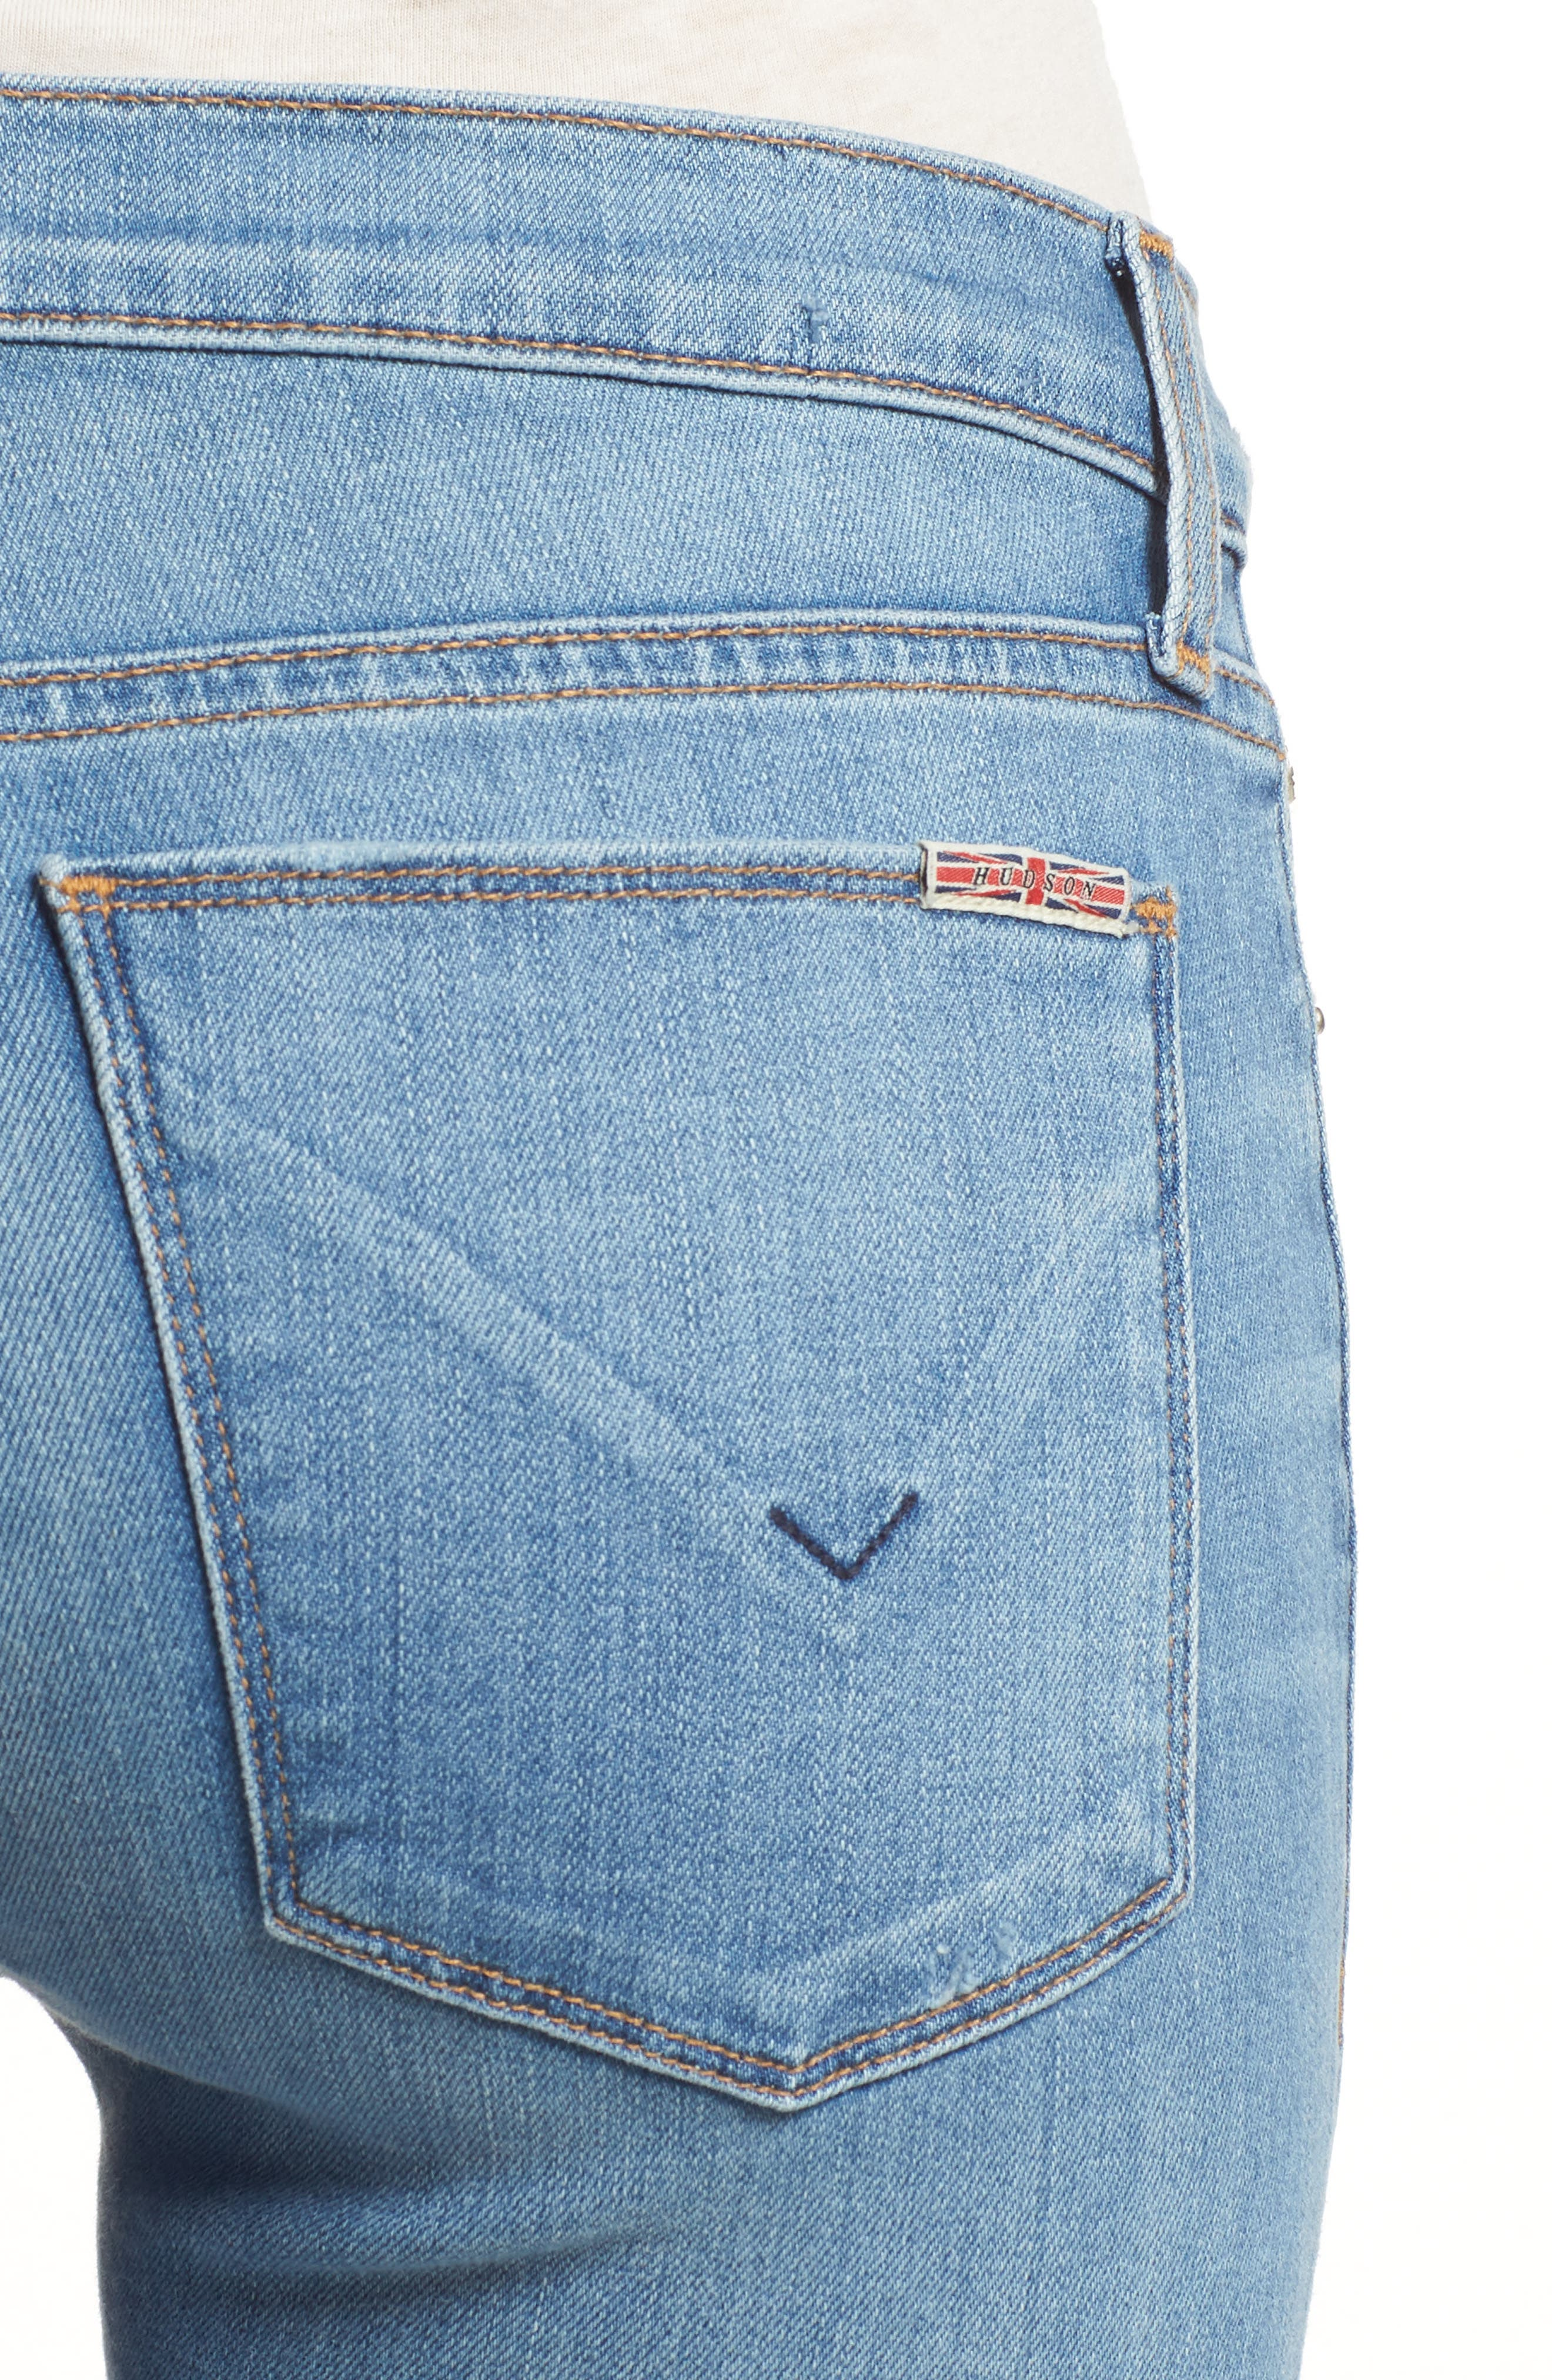 Krista Ankle Super Skinny Jeans,                             Alternate thumbnail 4, color,                             420